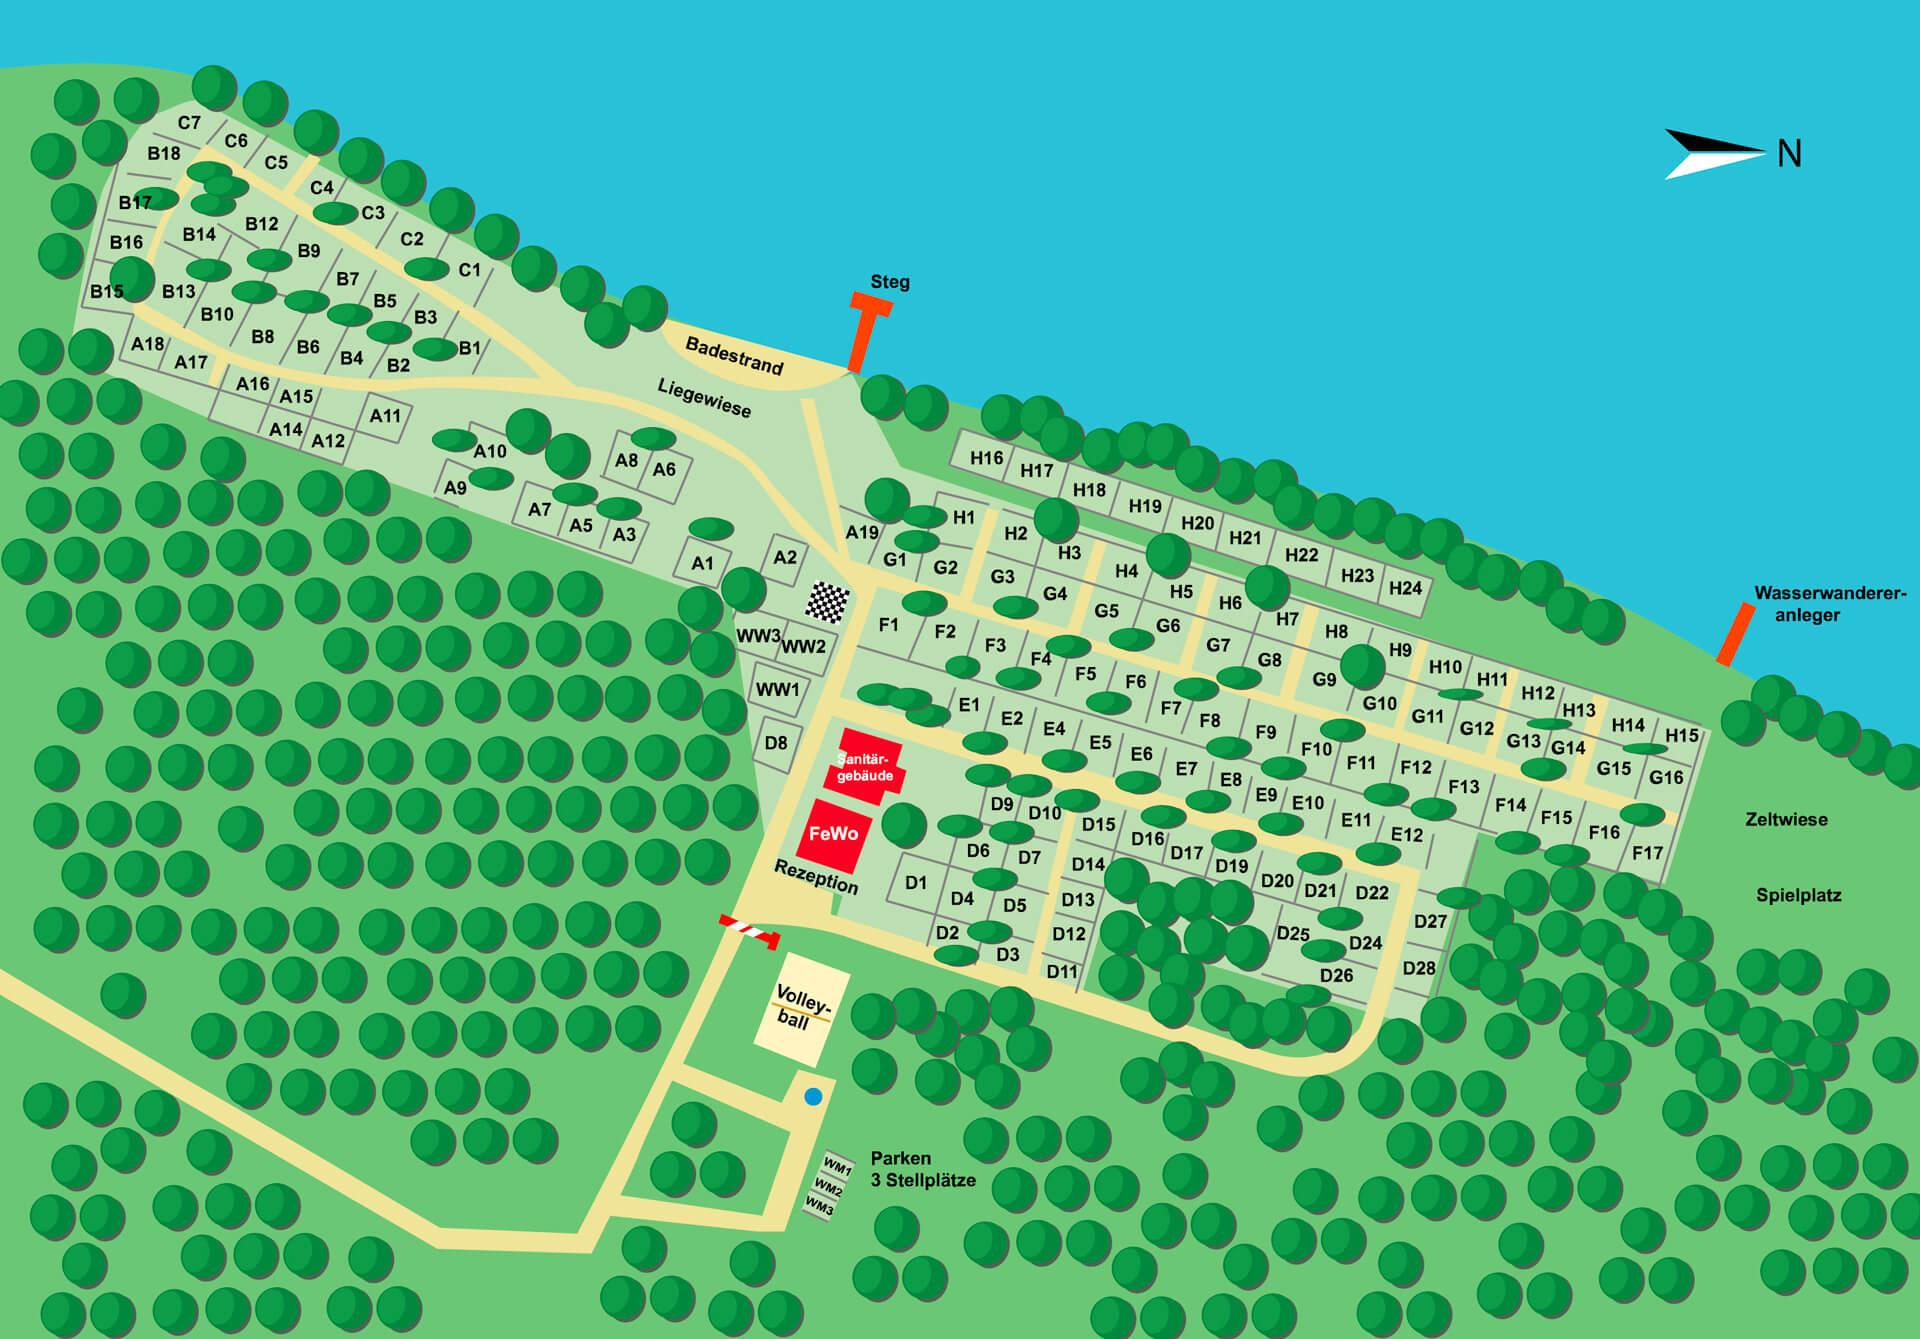 Unser Camping Platzplan 2018 mit allen Stellplätzen um den Rätzsee